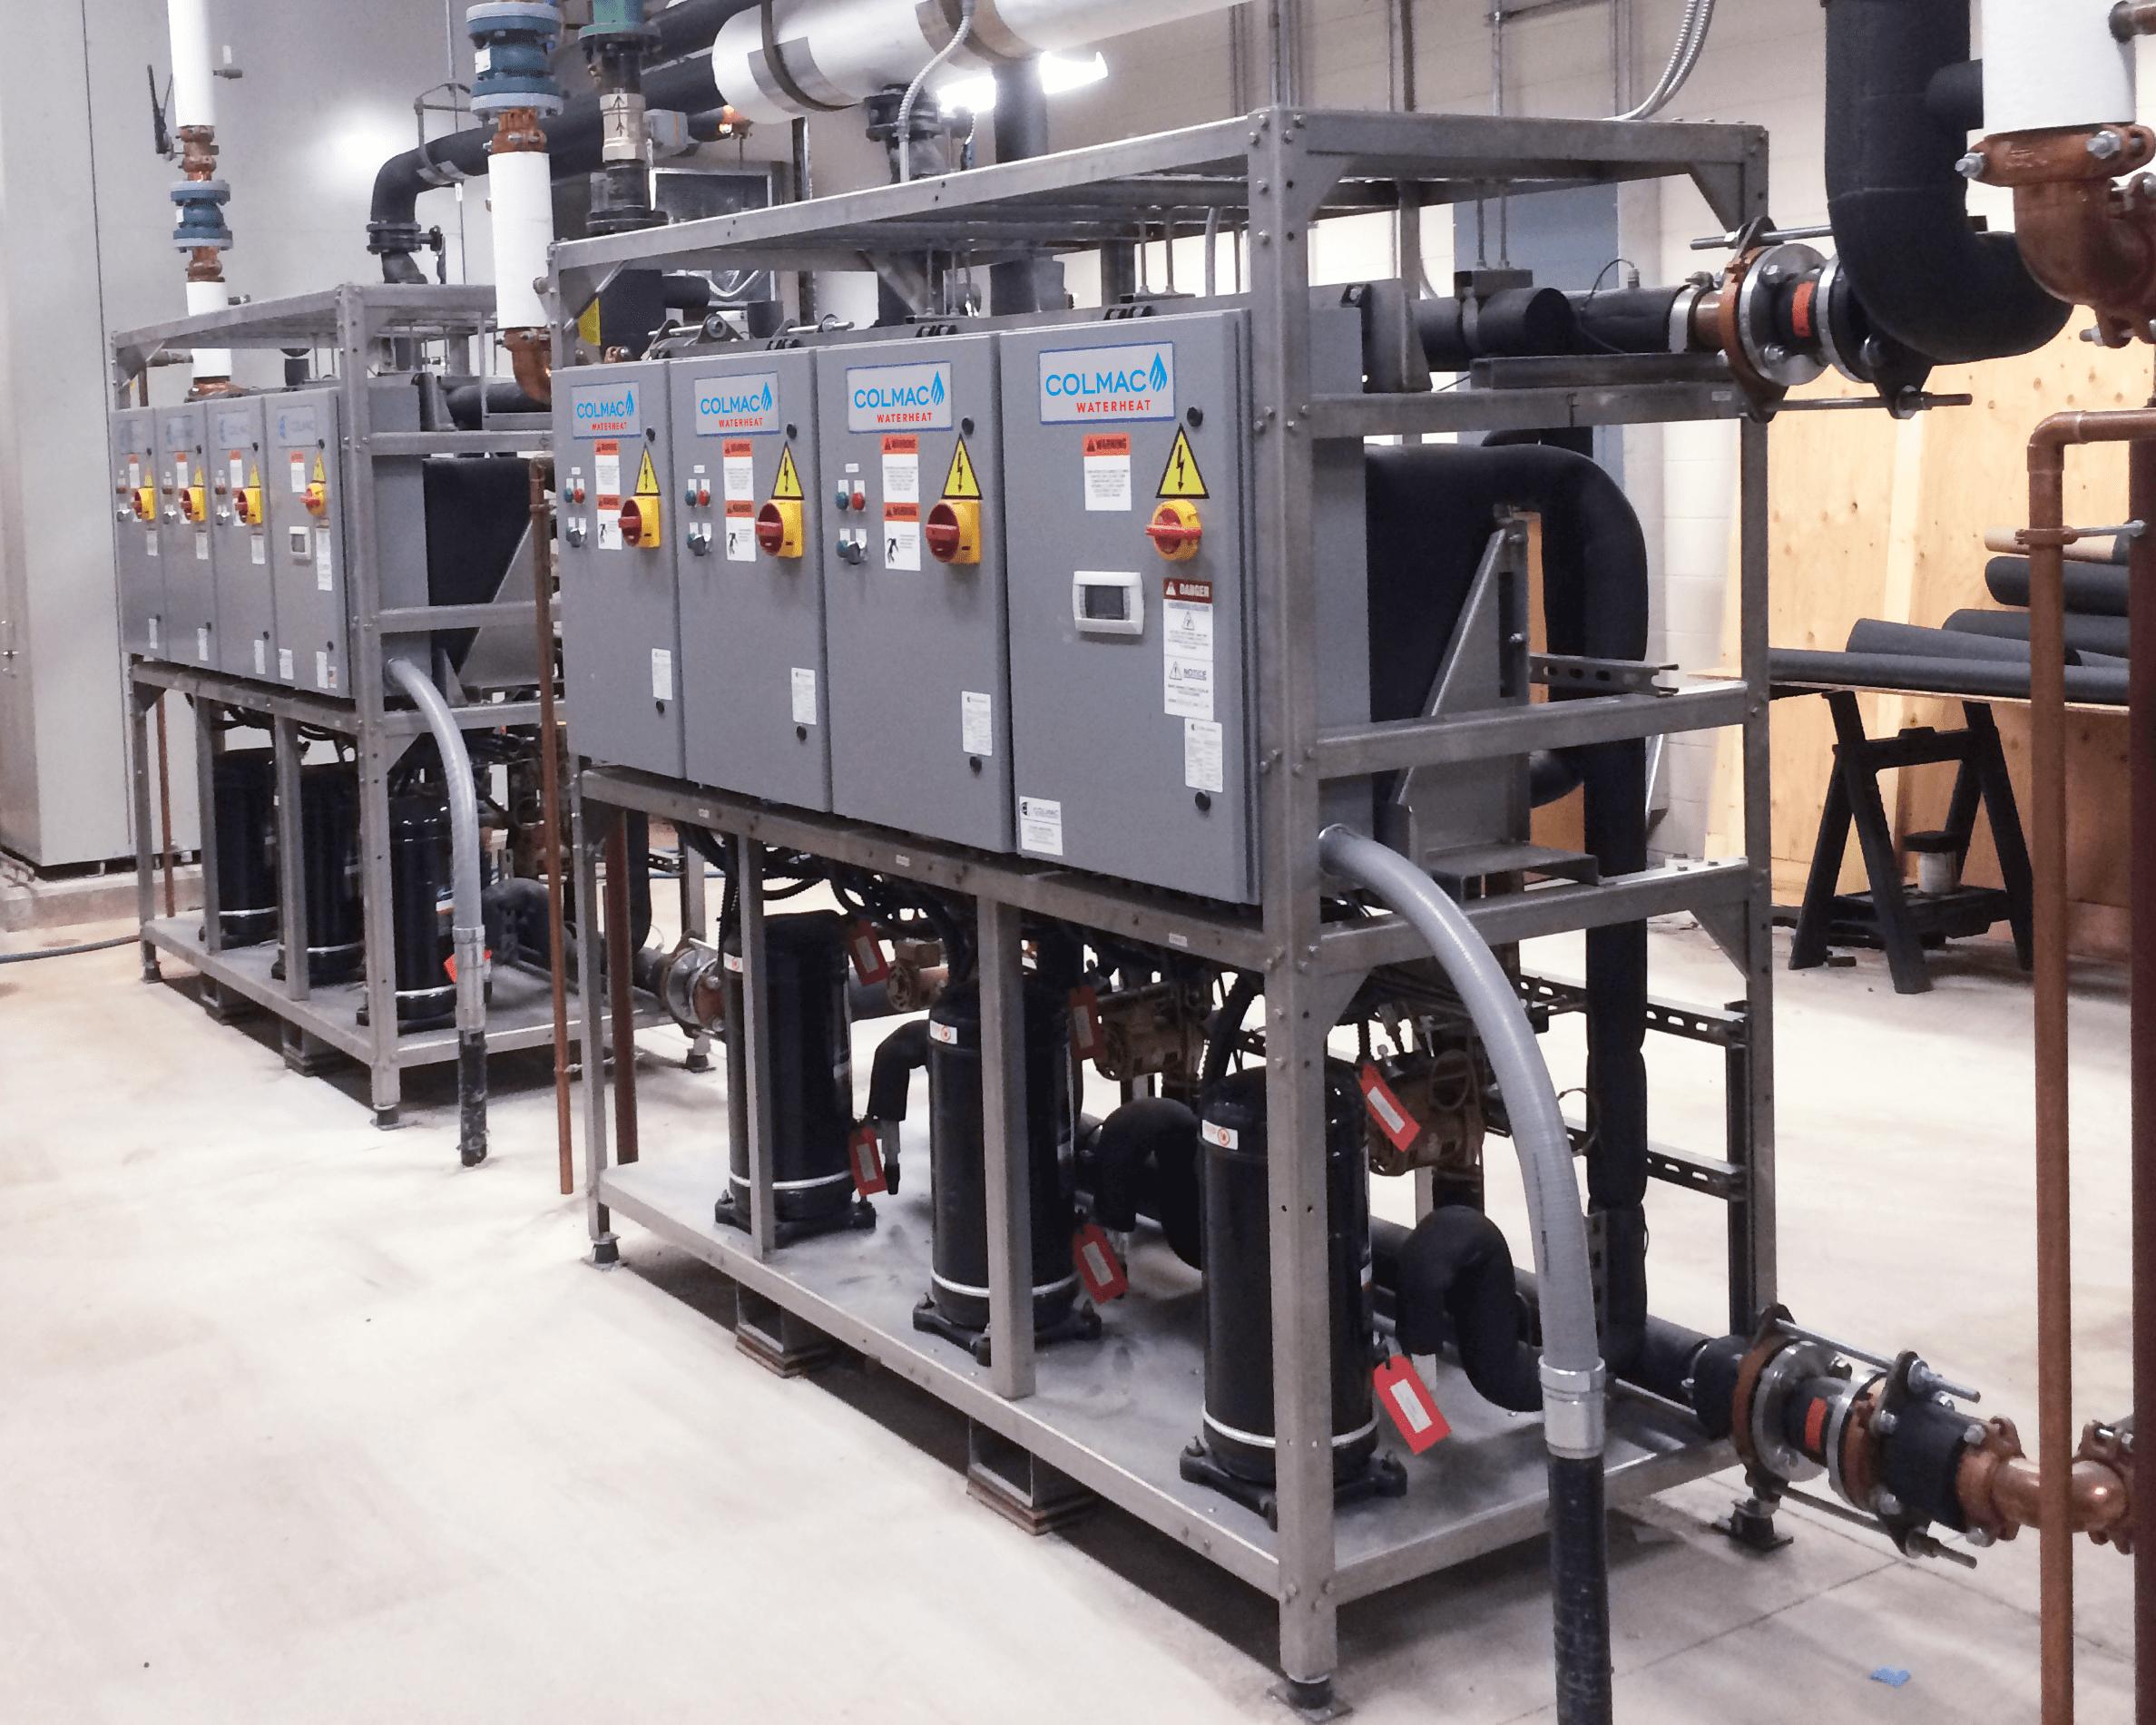 Colmac Heat Pumps